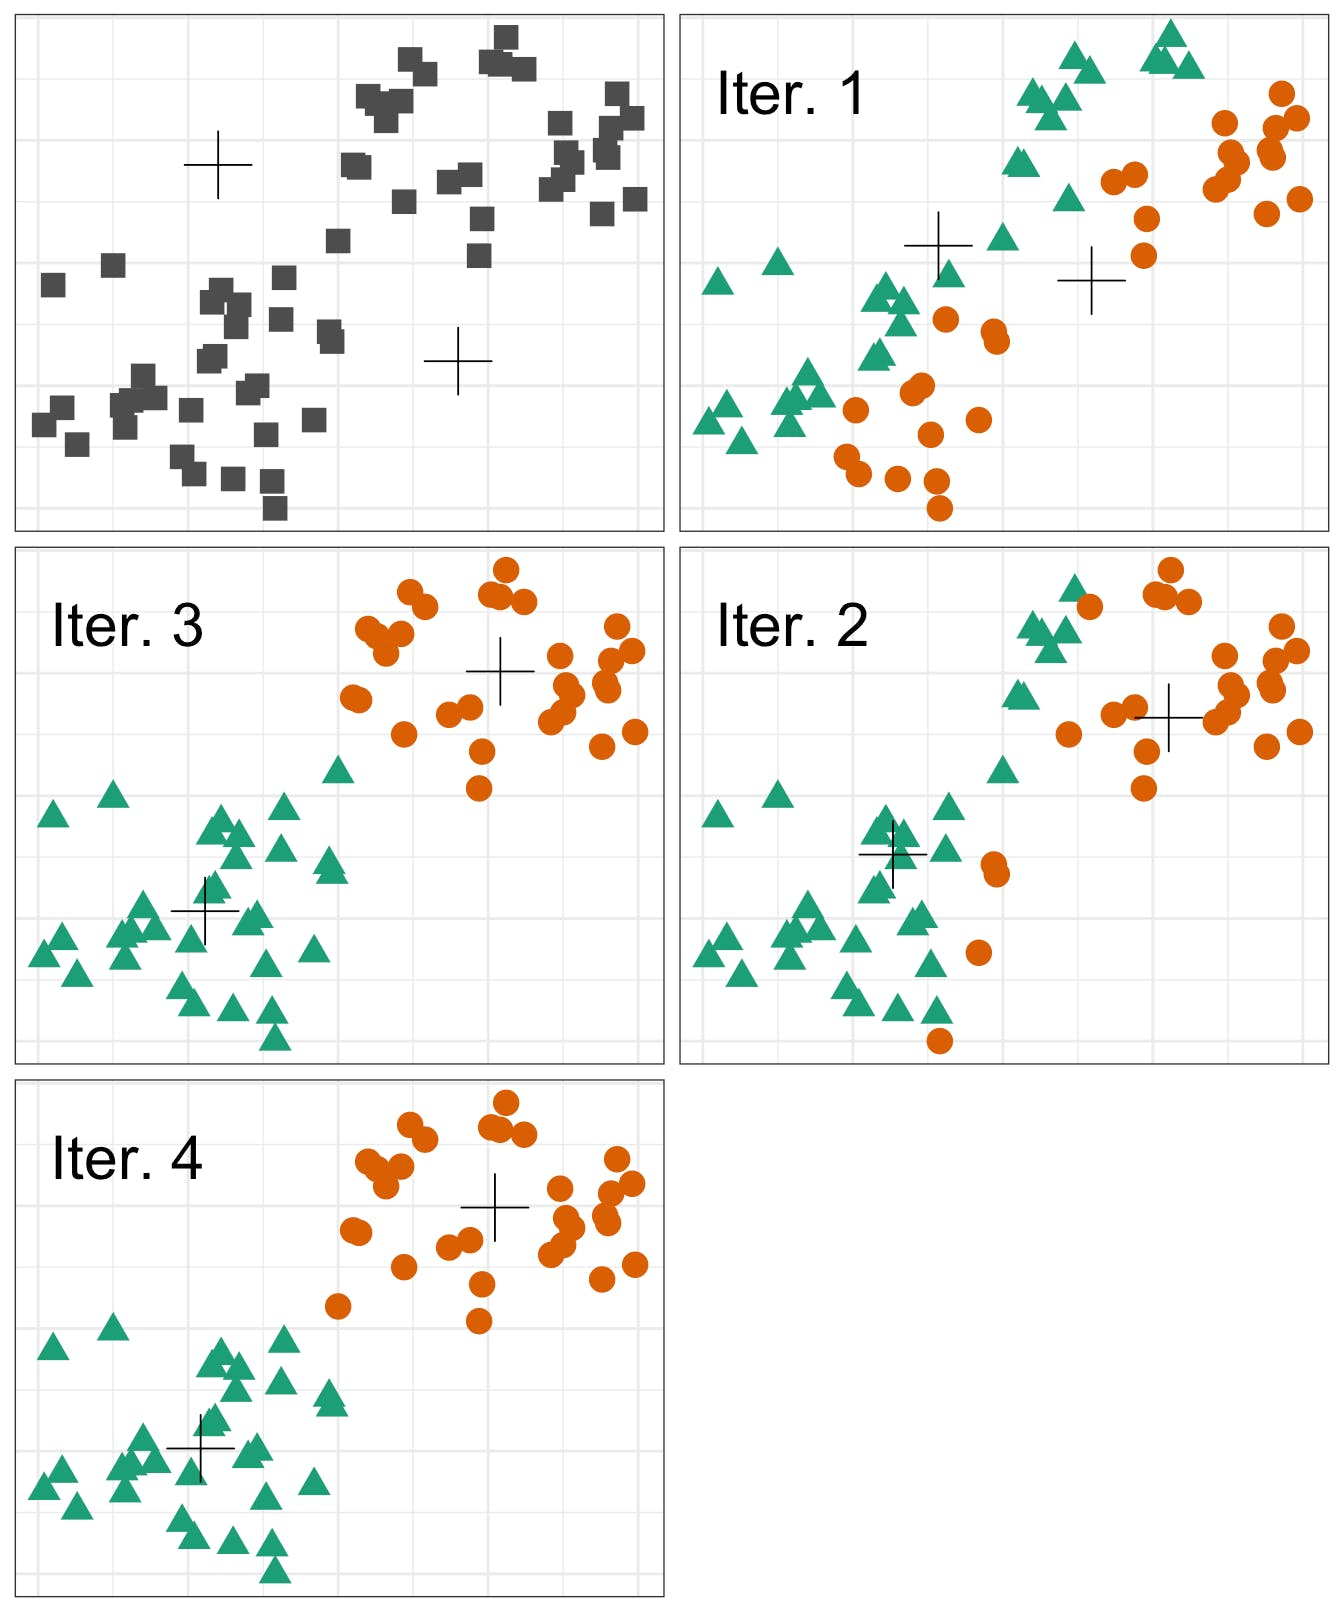 k-means-clustering.png